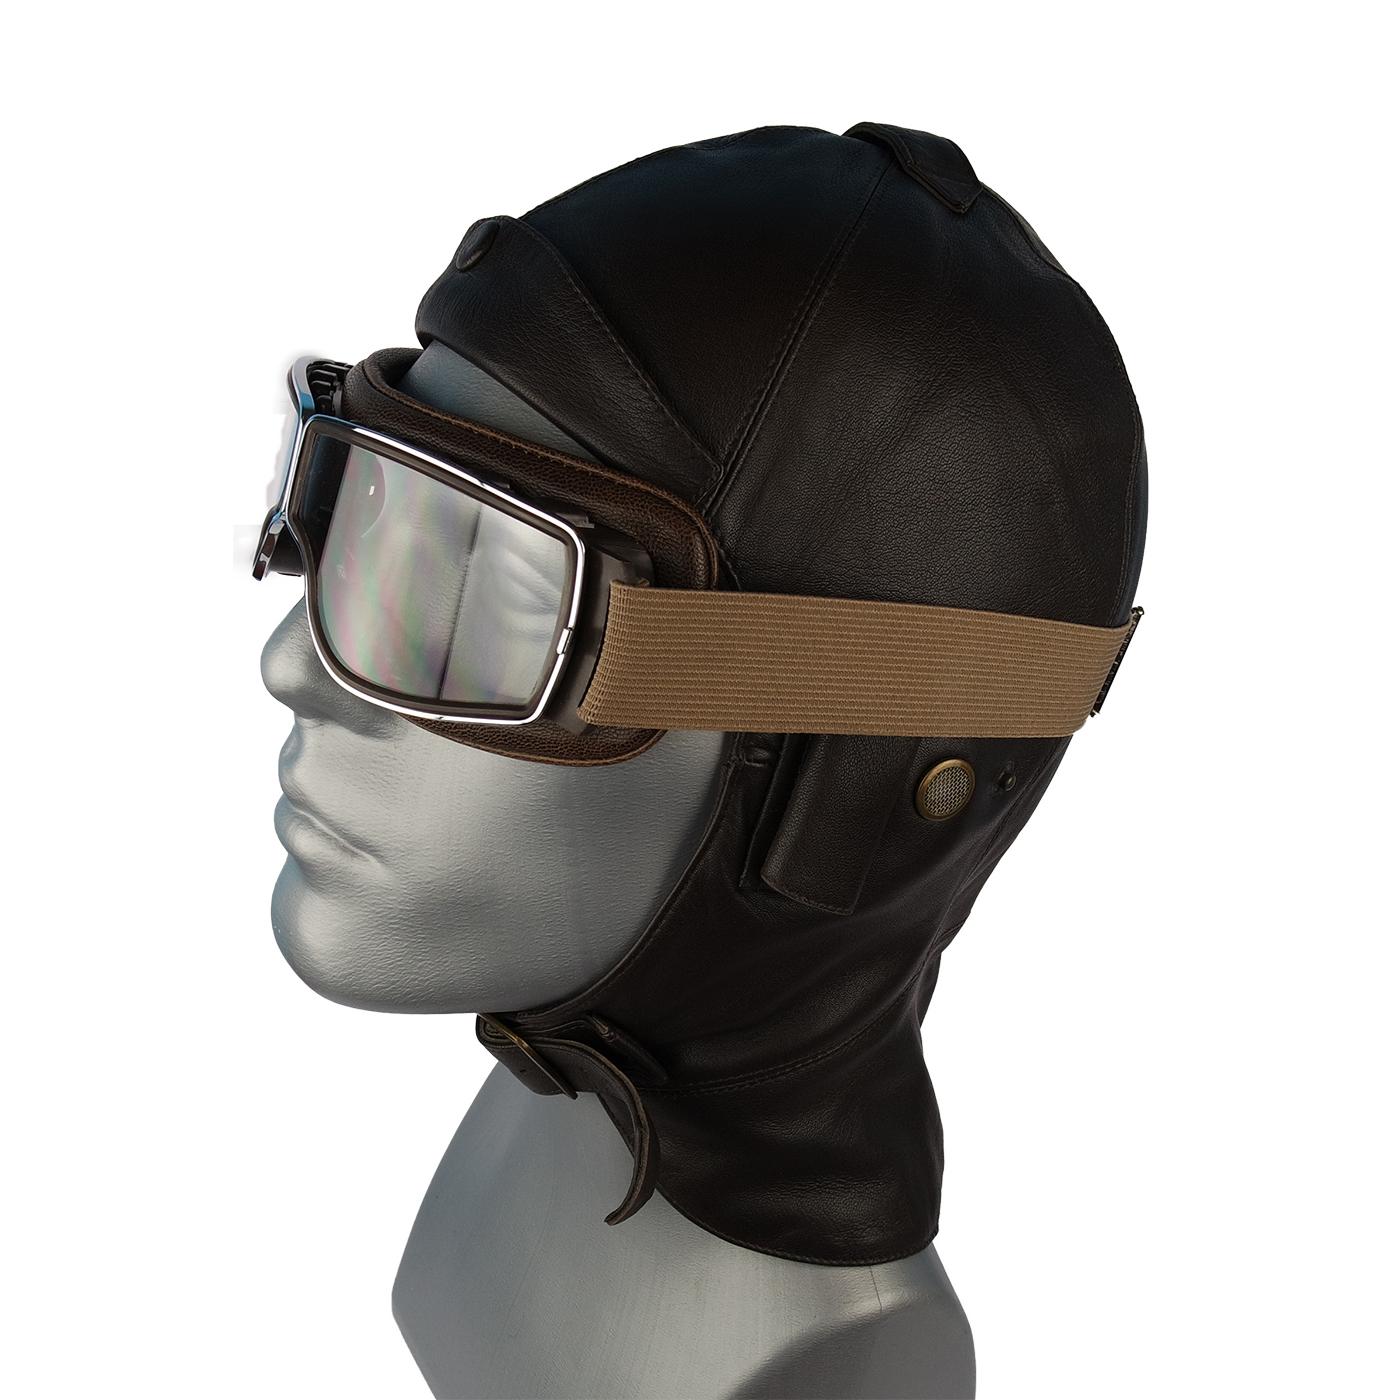 aviator t2 brille f r brillentr ger in braun mit get ntem. Black Bedroom Furniture Sets. Home Design Ideas